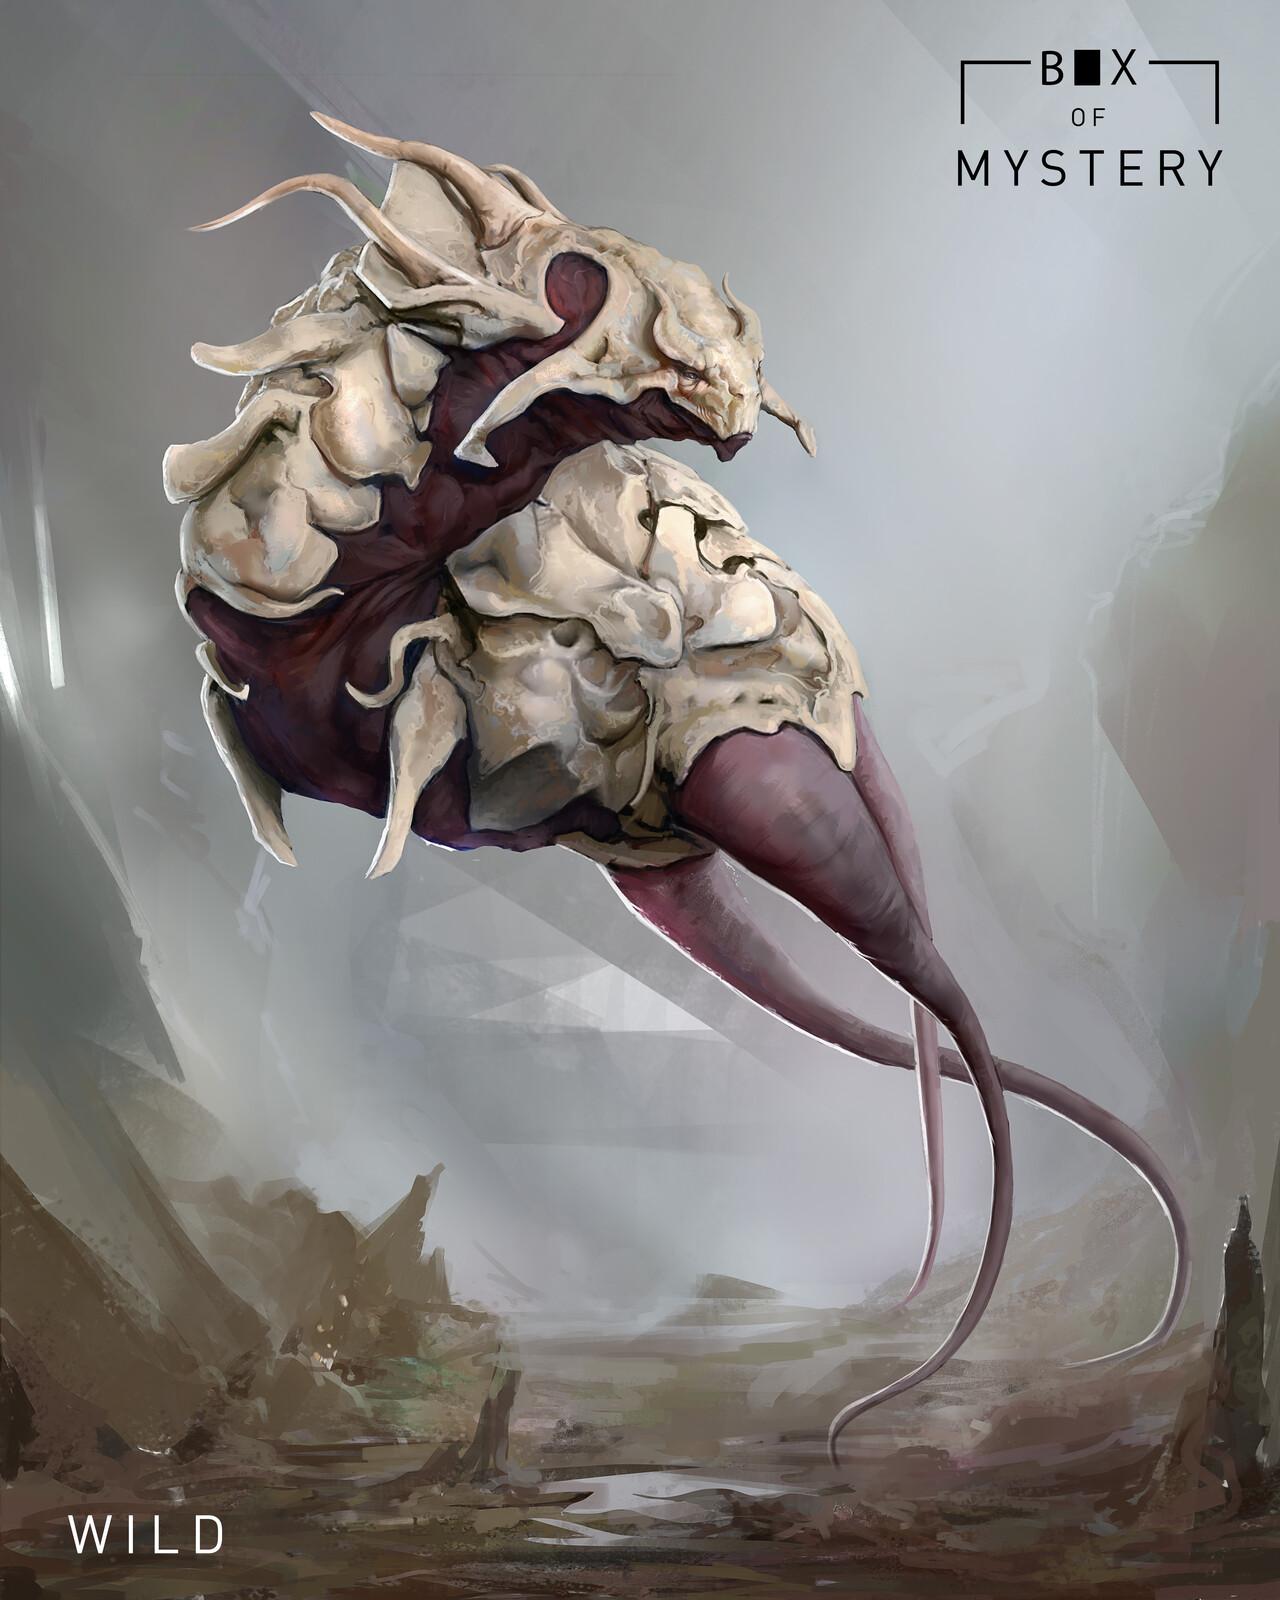 Challenge - Box of Mystery: Wild